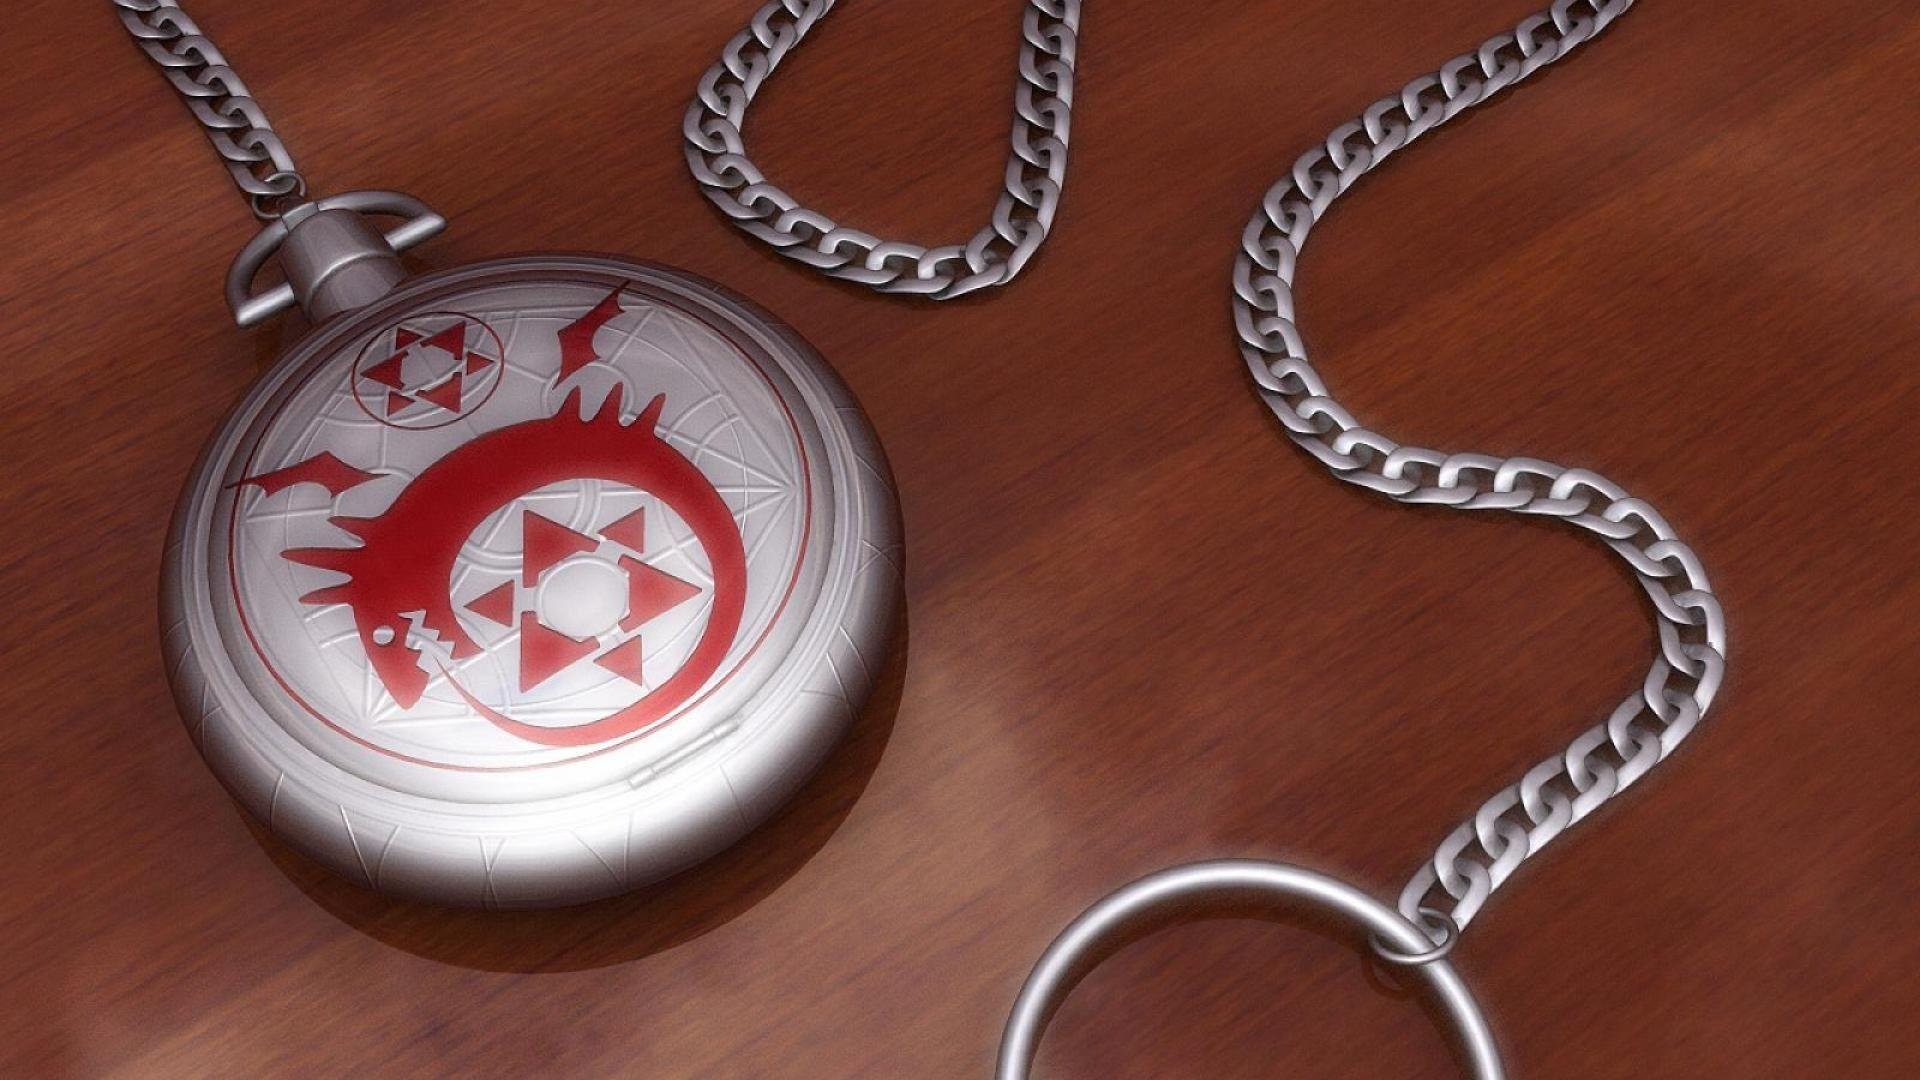 1920x1080 Fullmetal Alchemist and the Broken Angel game ...